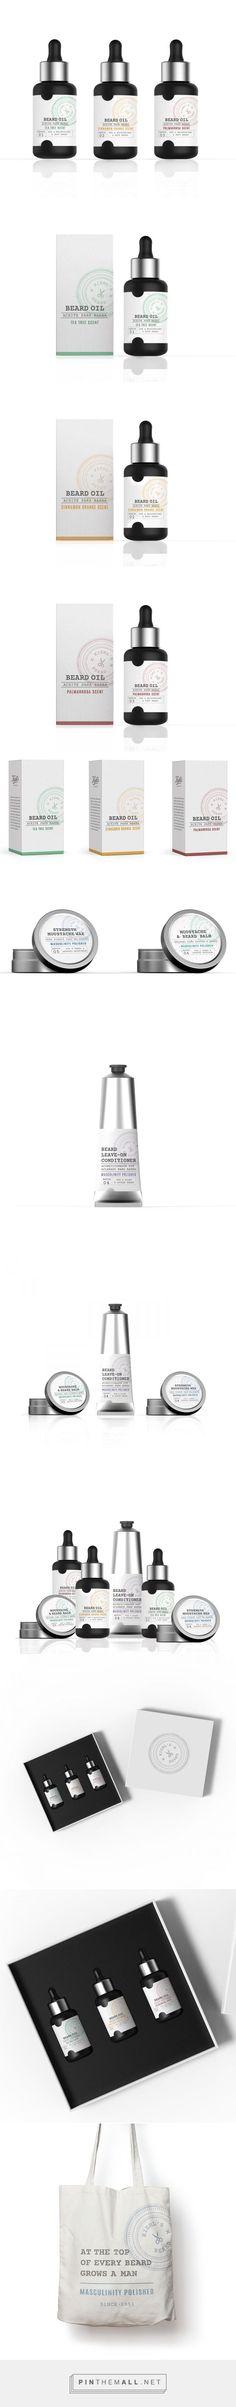 Khiel's Beard Polished Brand Mens Facial Care Packaging by Elisavapack | Fivestar Branding – Design and Branding Agency & Inspiration Gallery